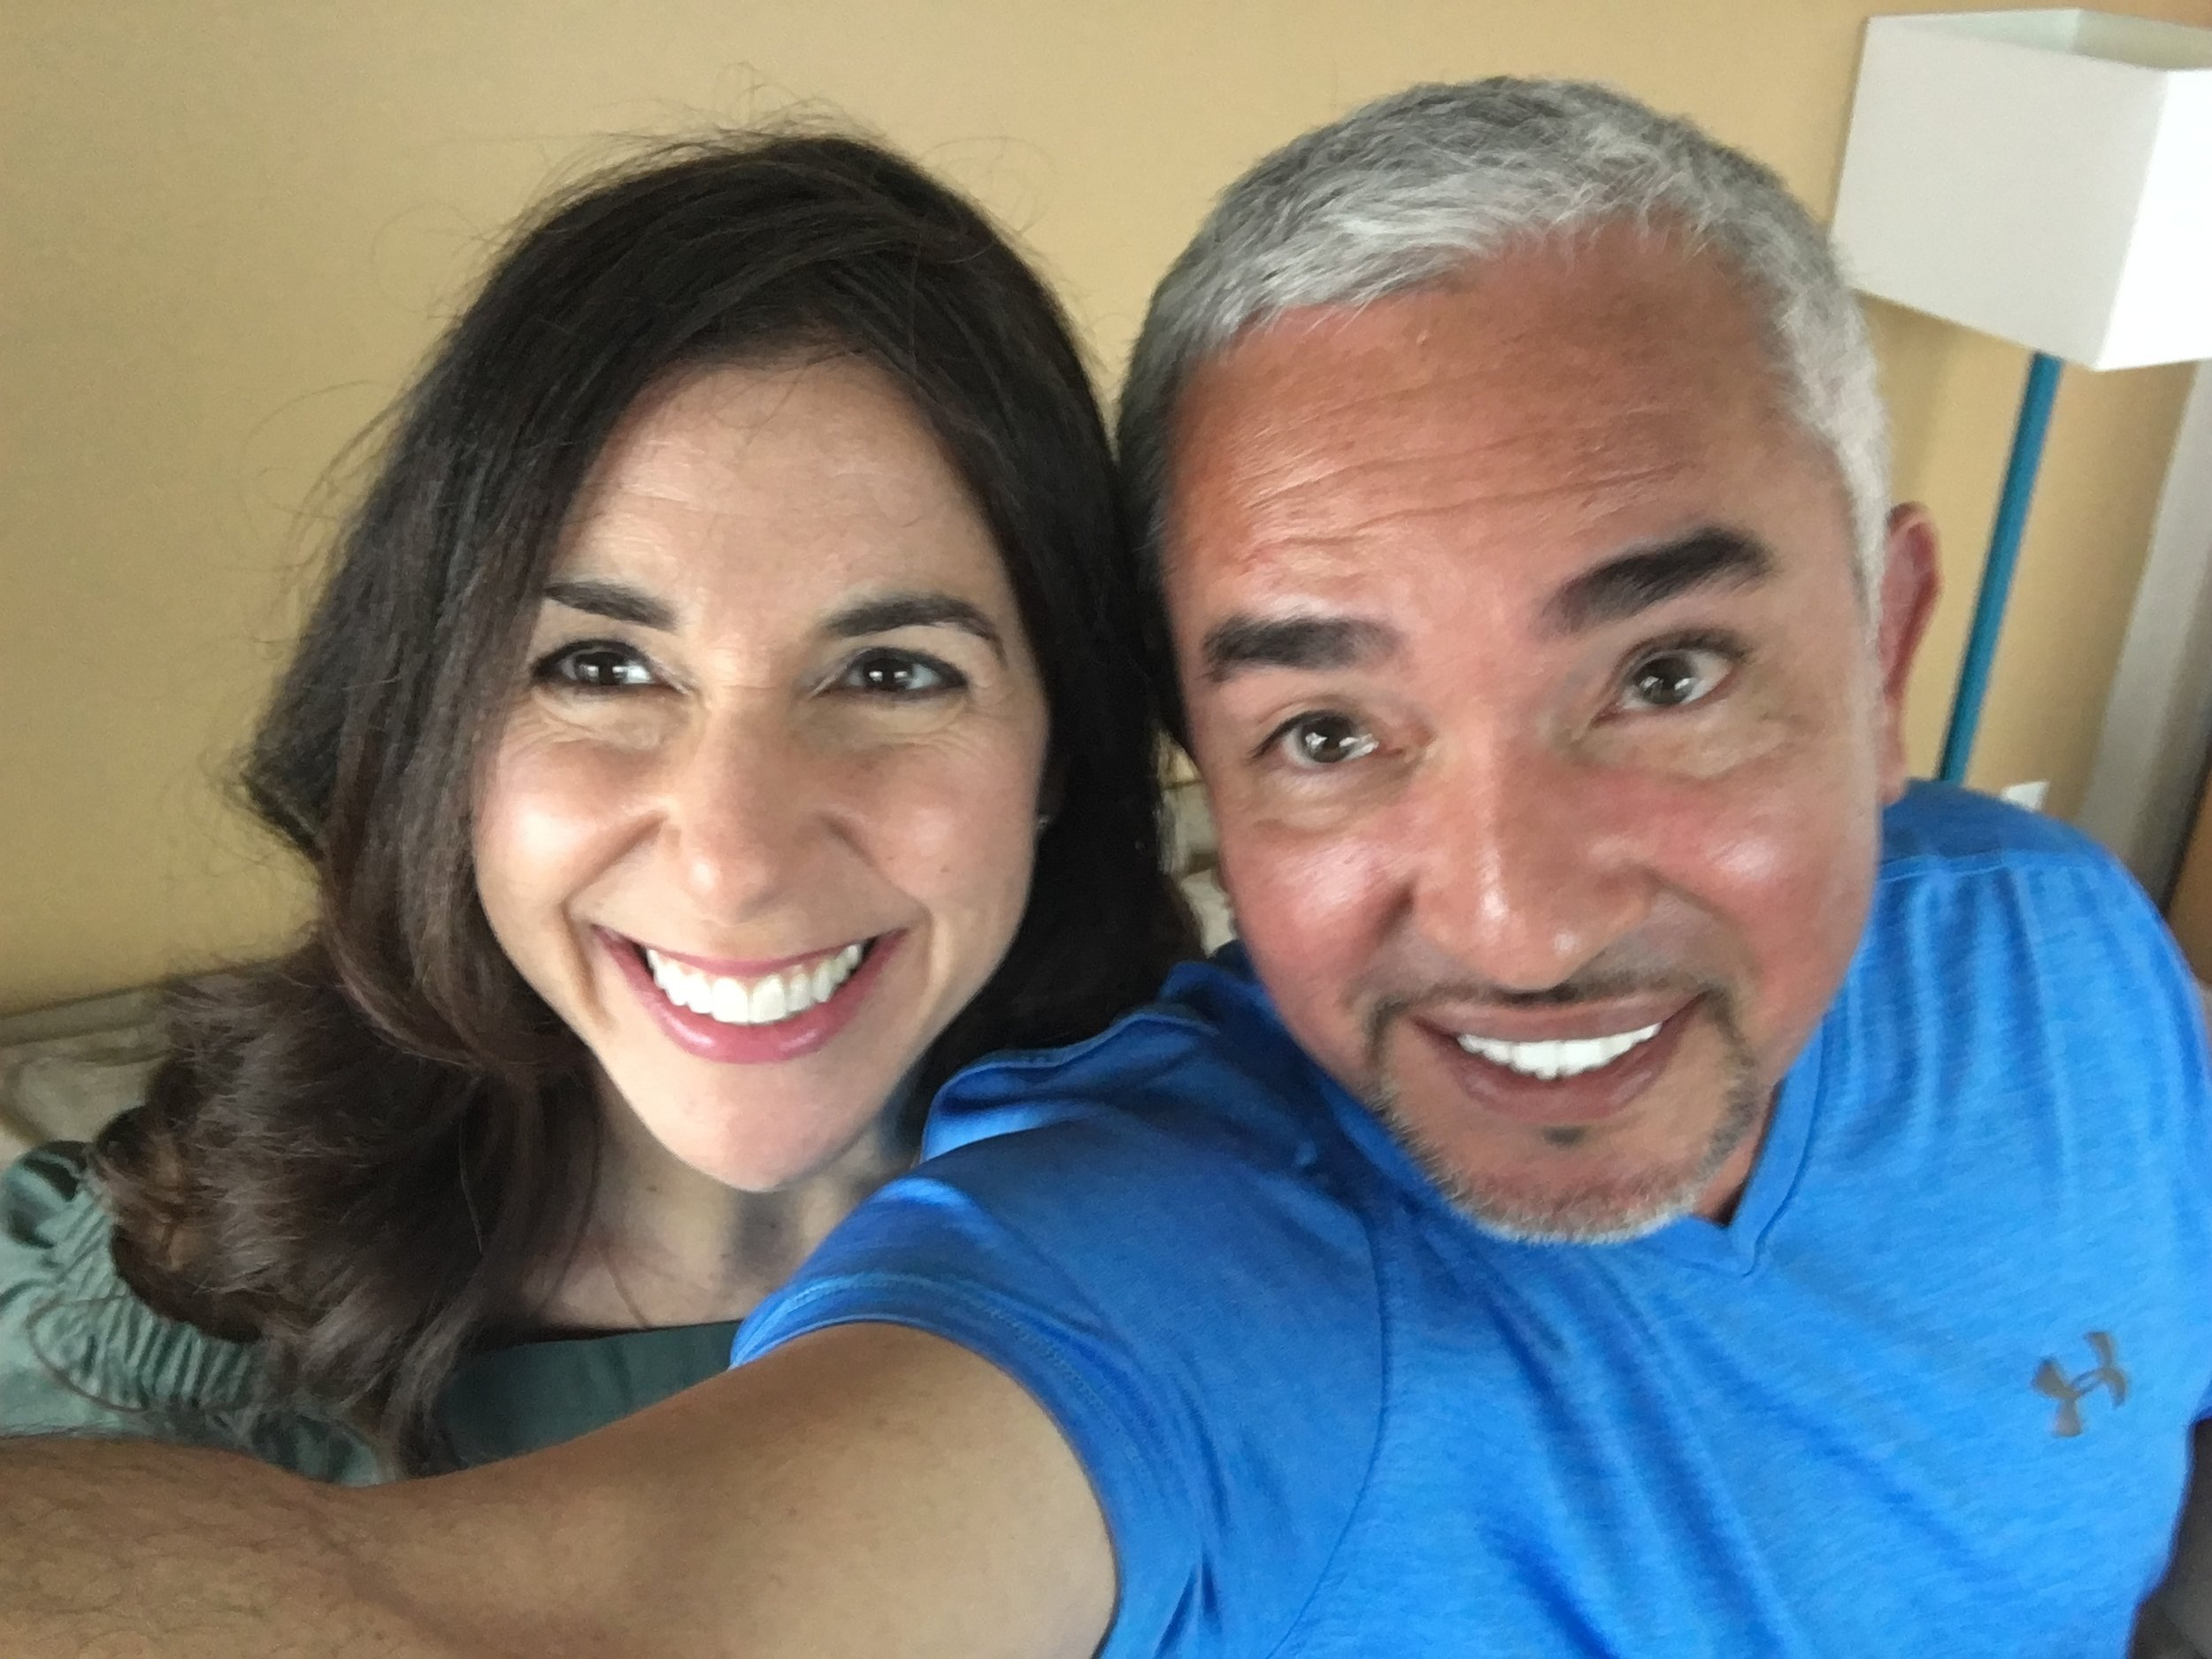 Cesar Millan and Kara Mayer Robinson SELFIE.JPG